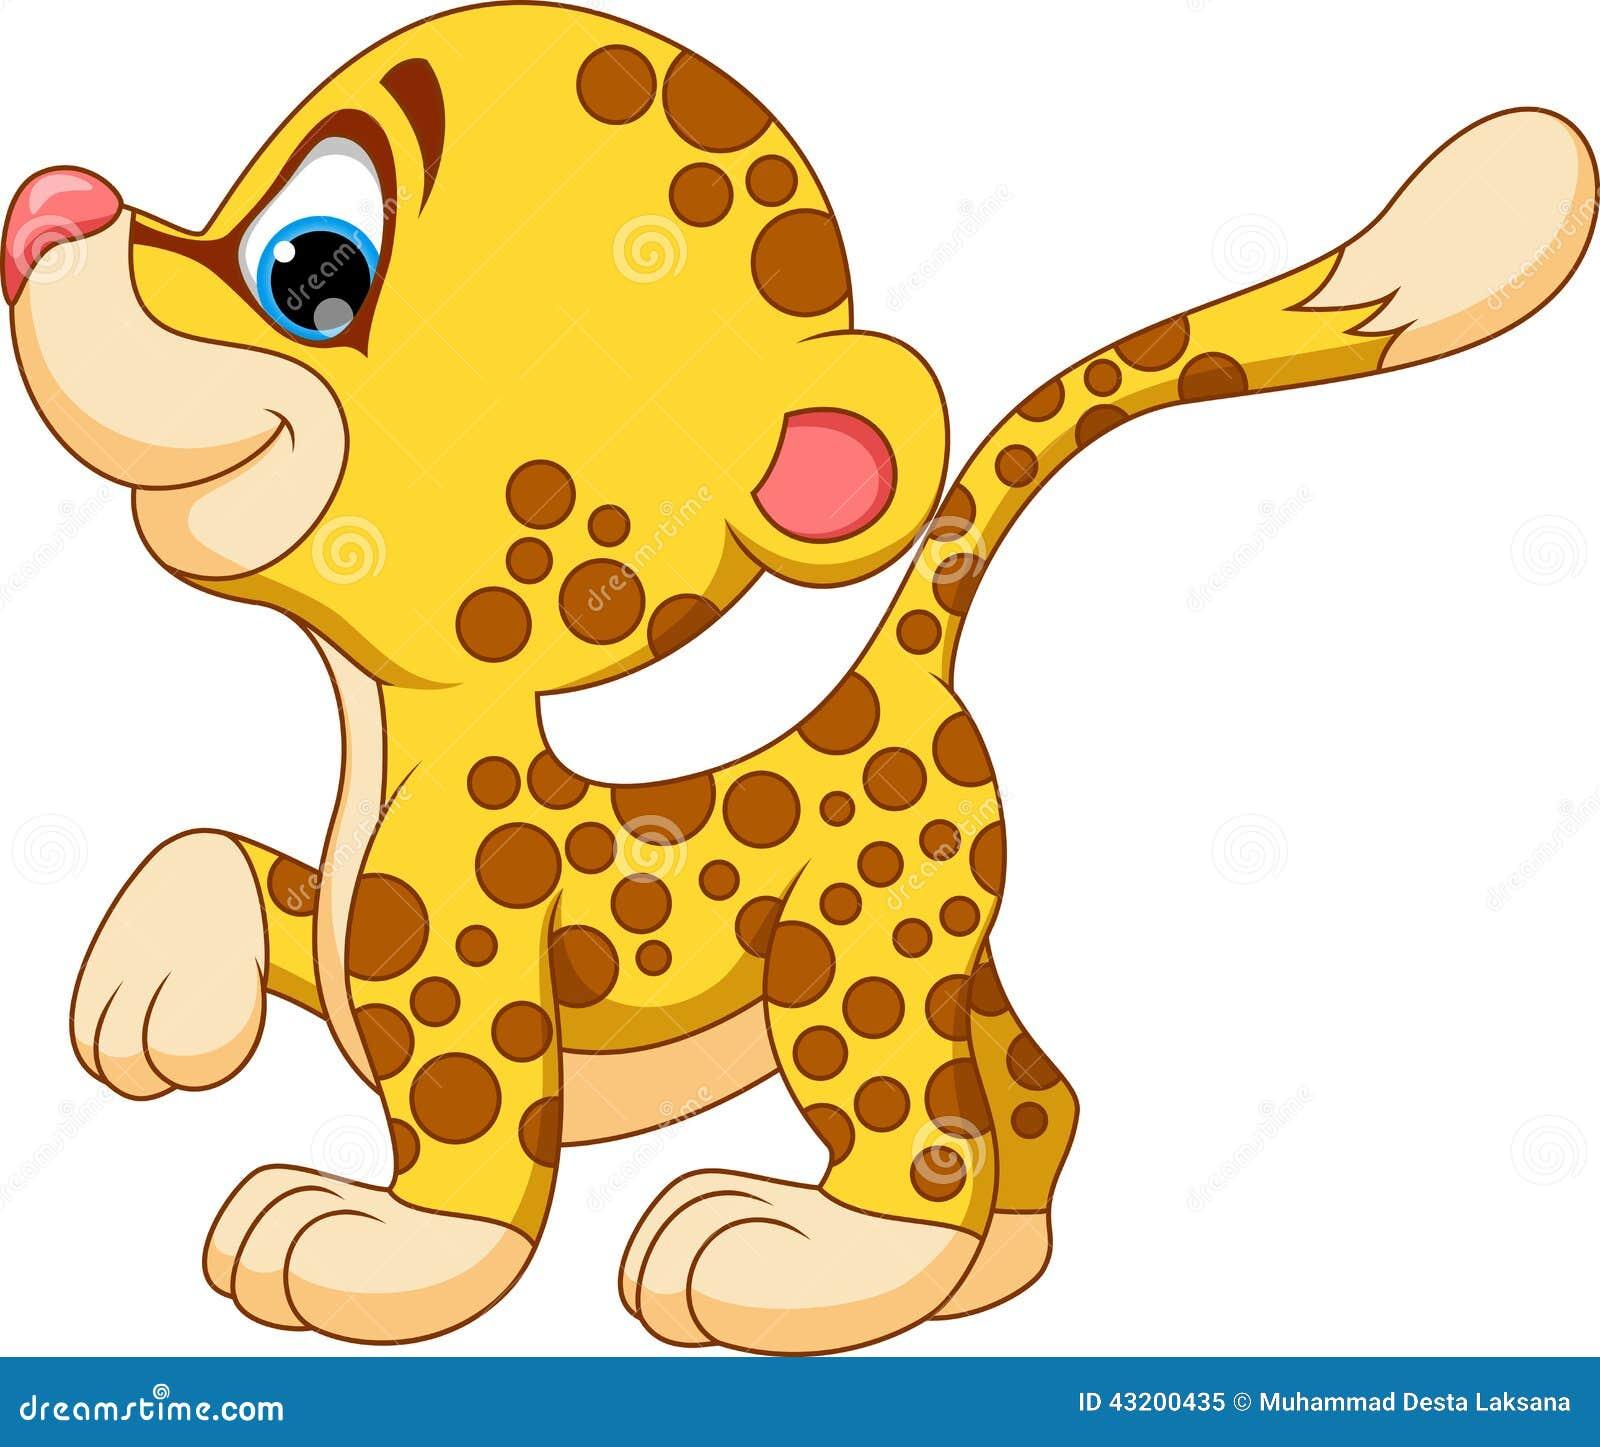 Cute Baby Cheetah Cartoon Stock Illustration Image 43200435